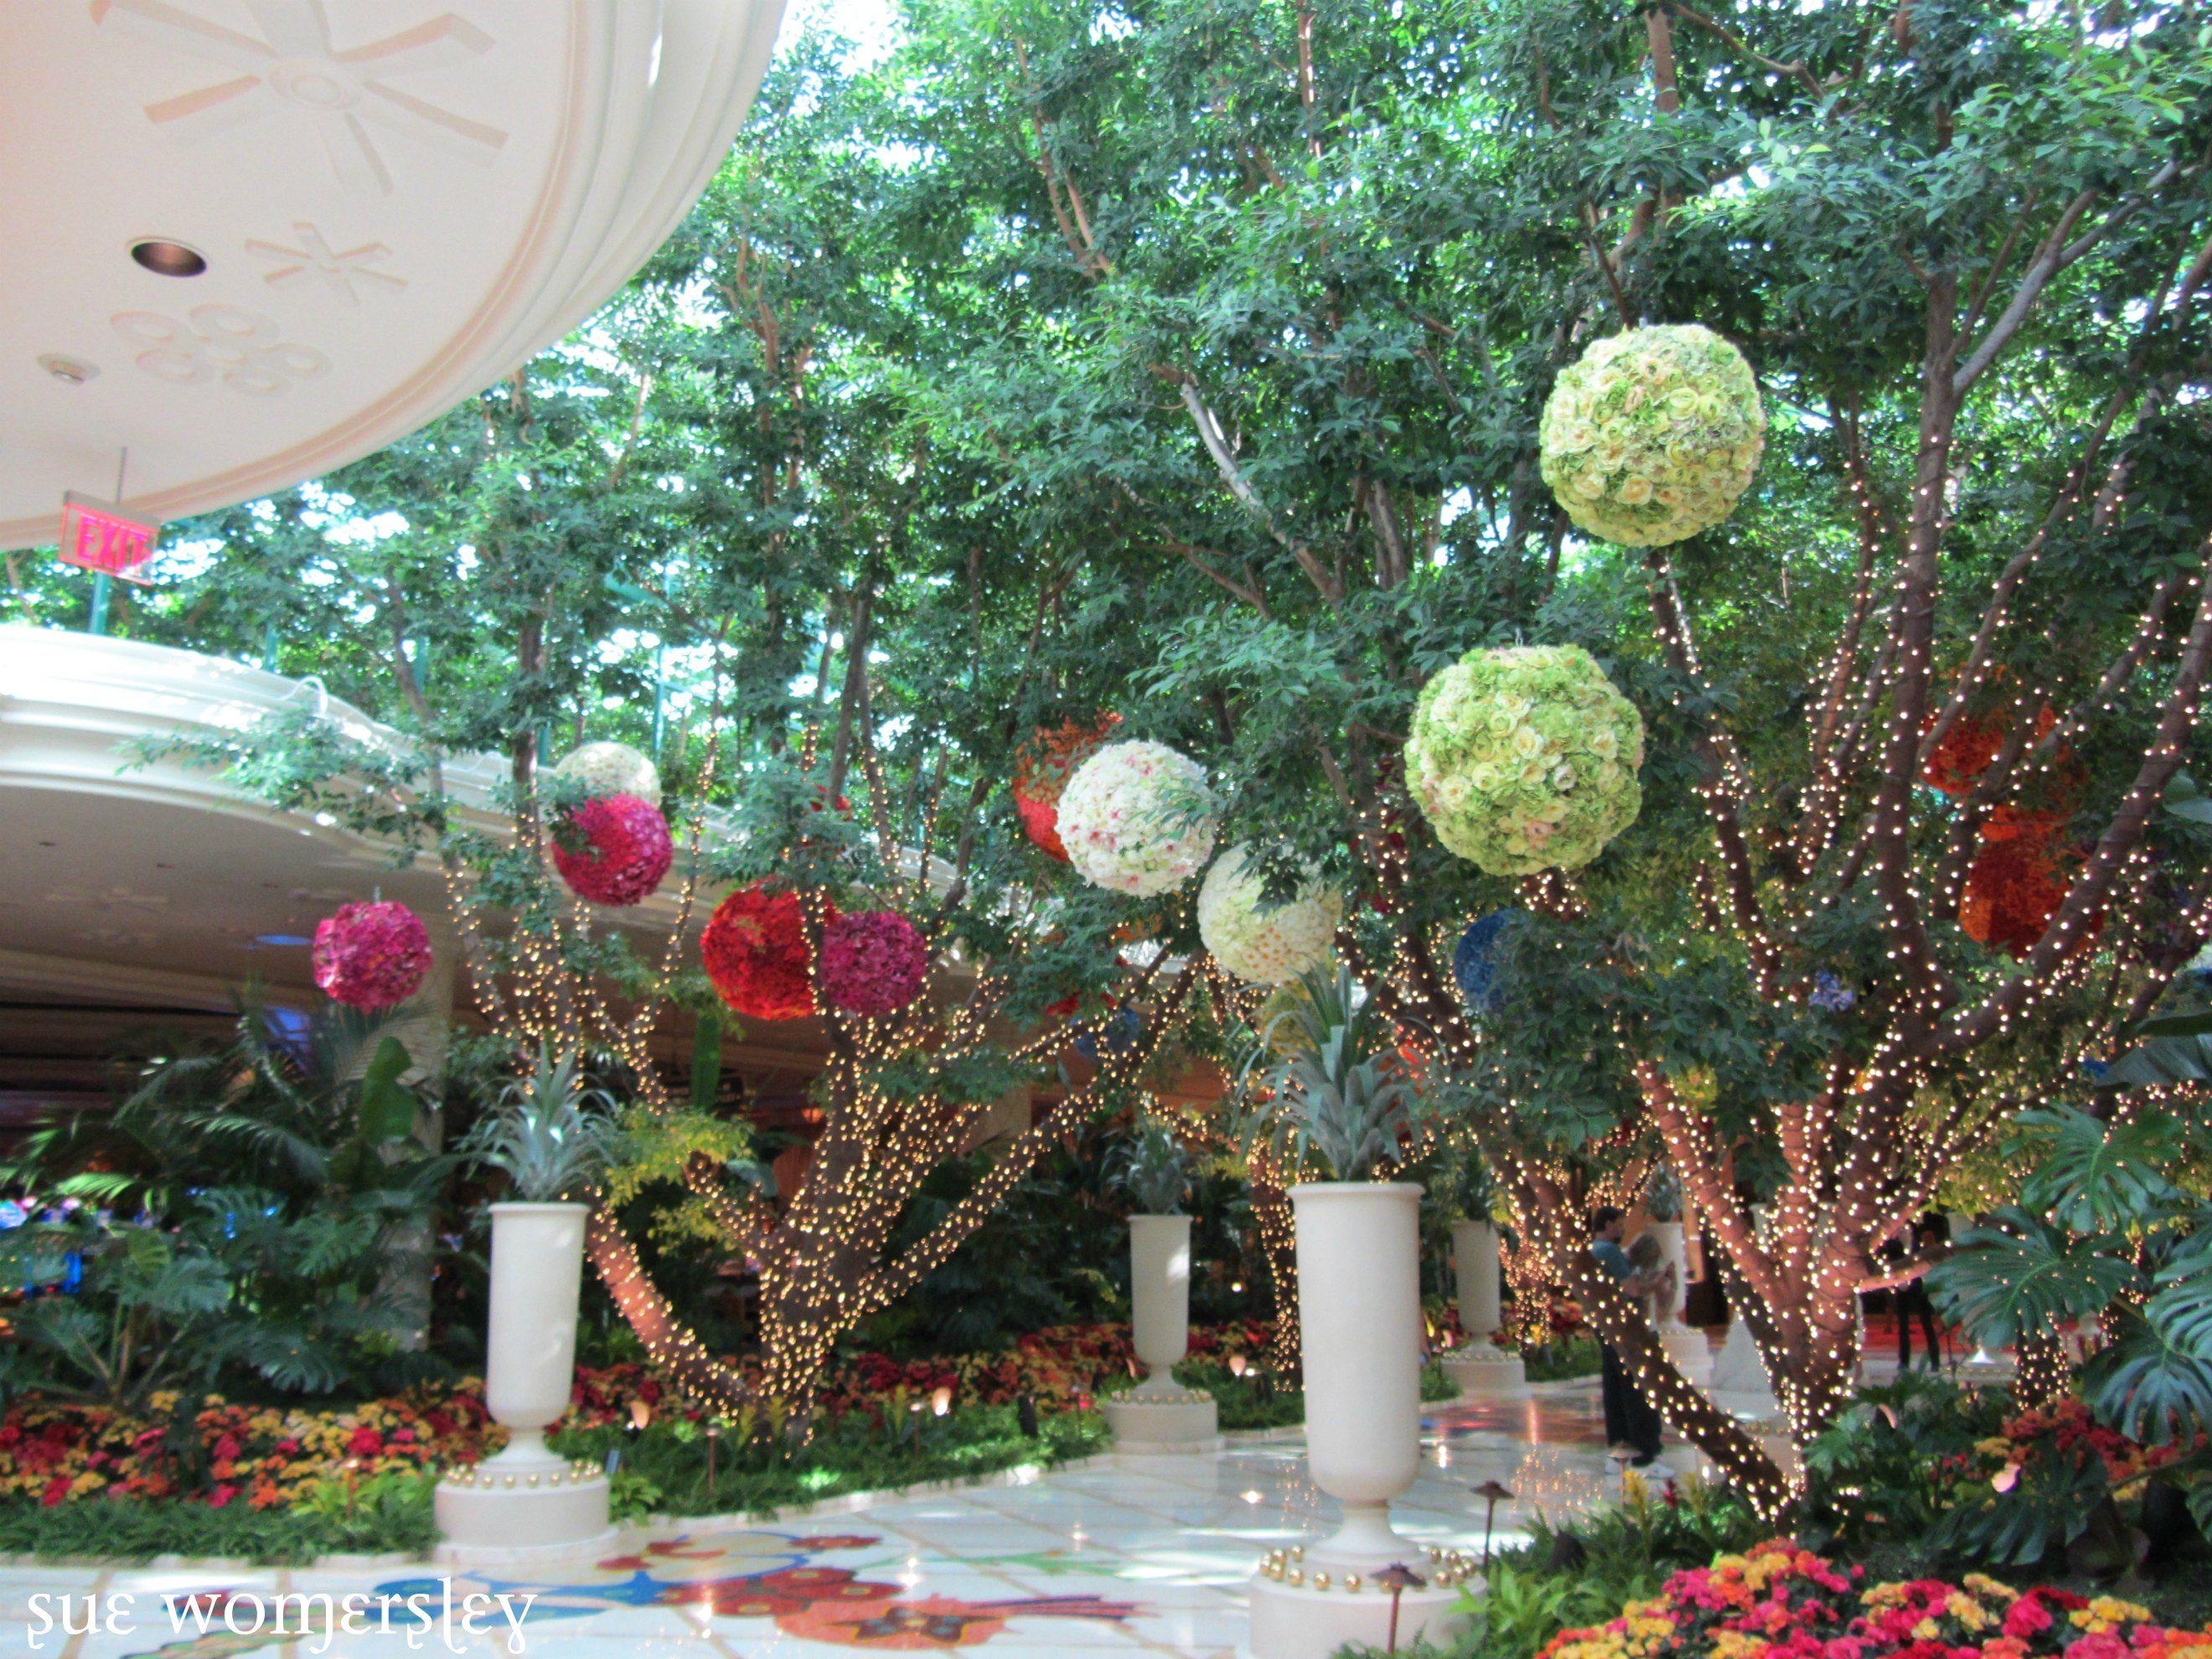 Hanging Flower Balls Wynn Las Vegas Flower Ball Decor Wedding Decorations